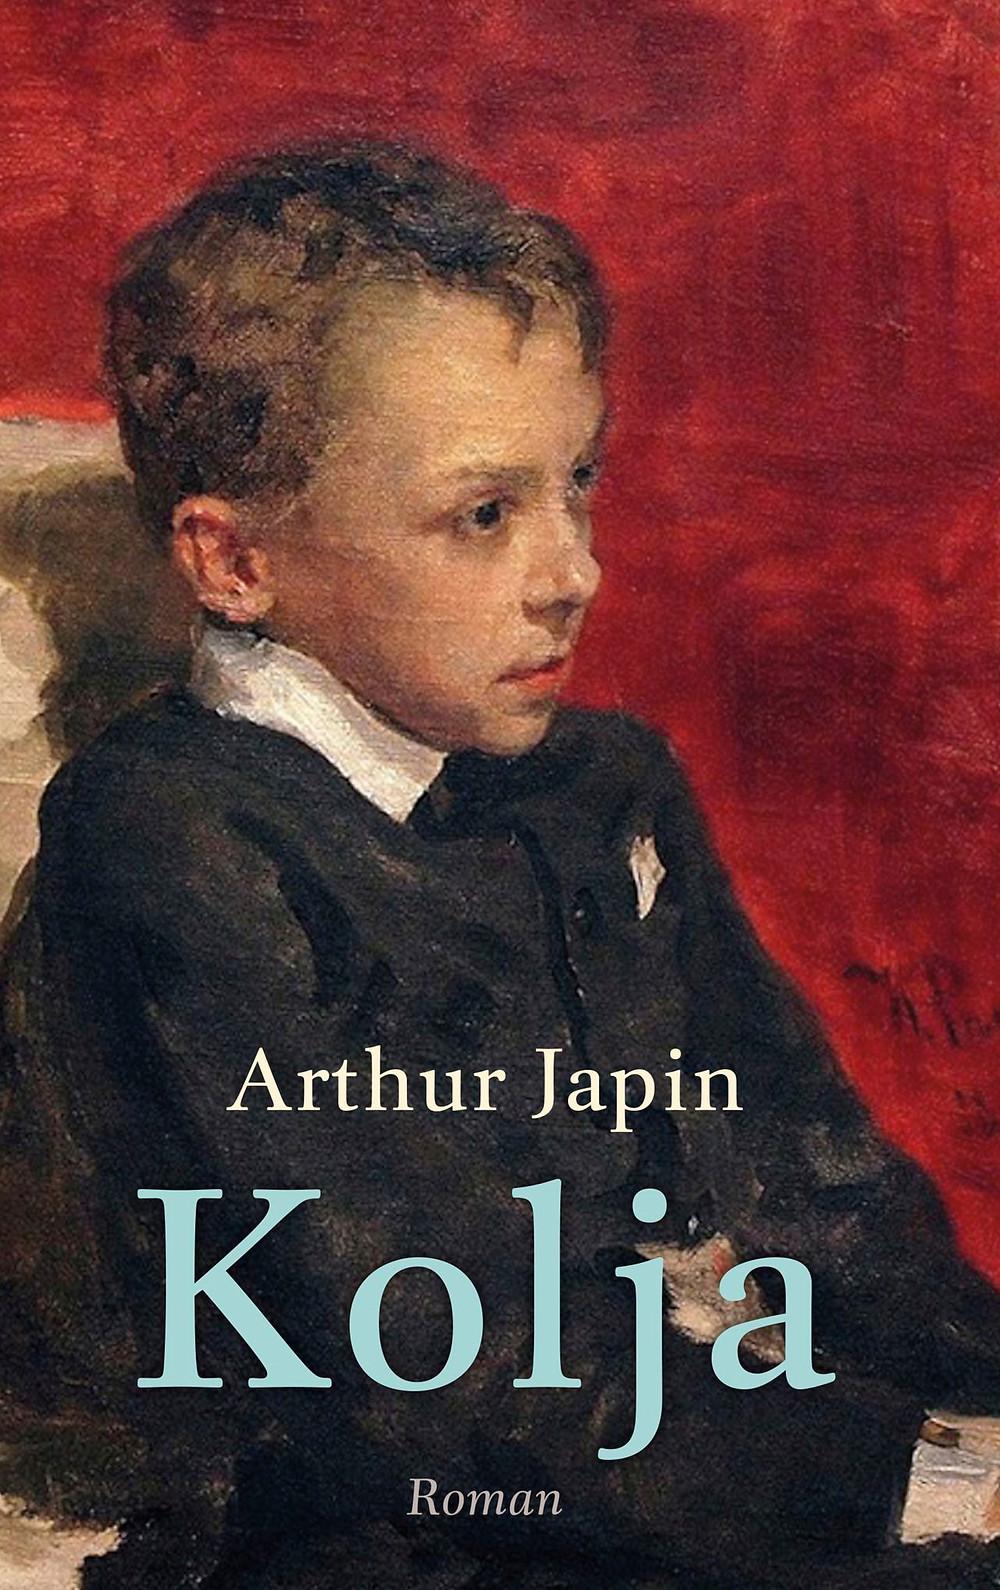 Kolja, Arthur Japin